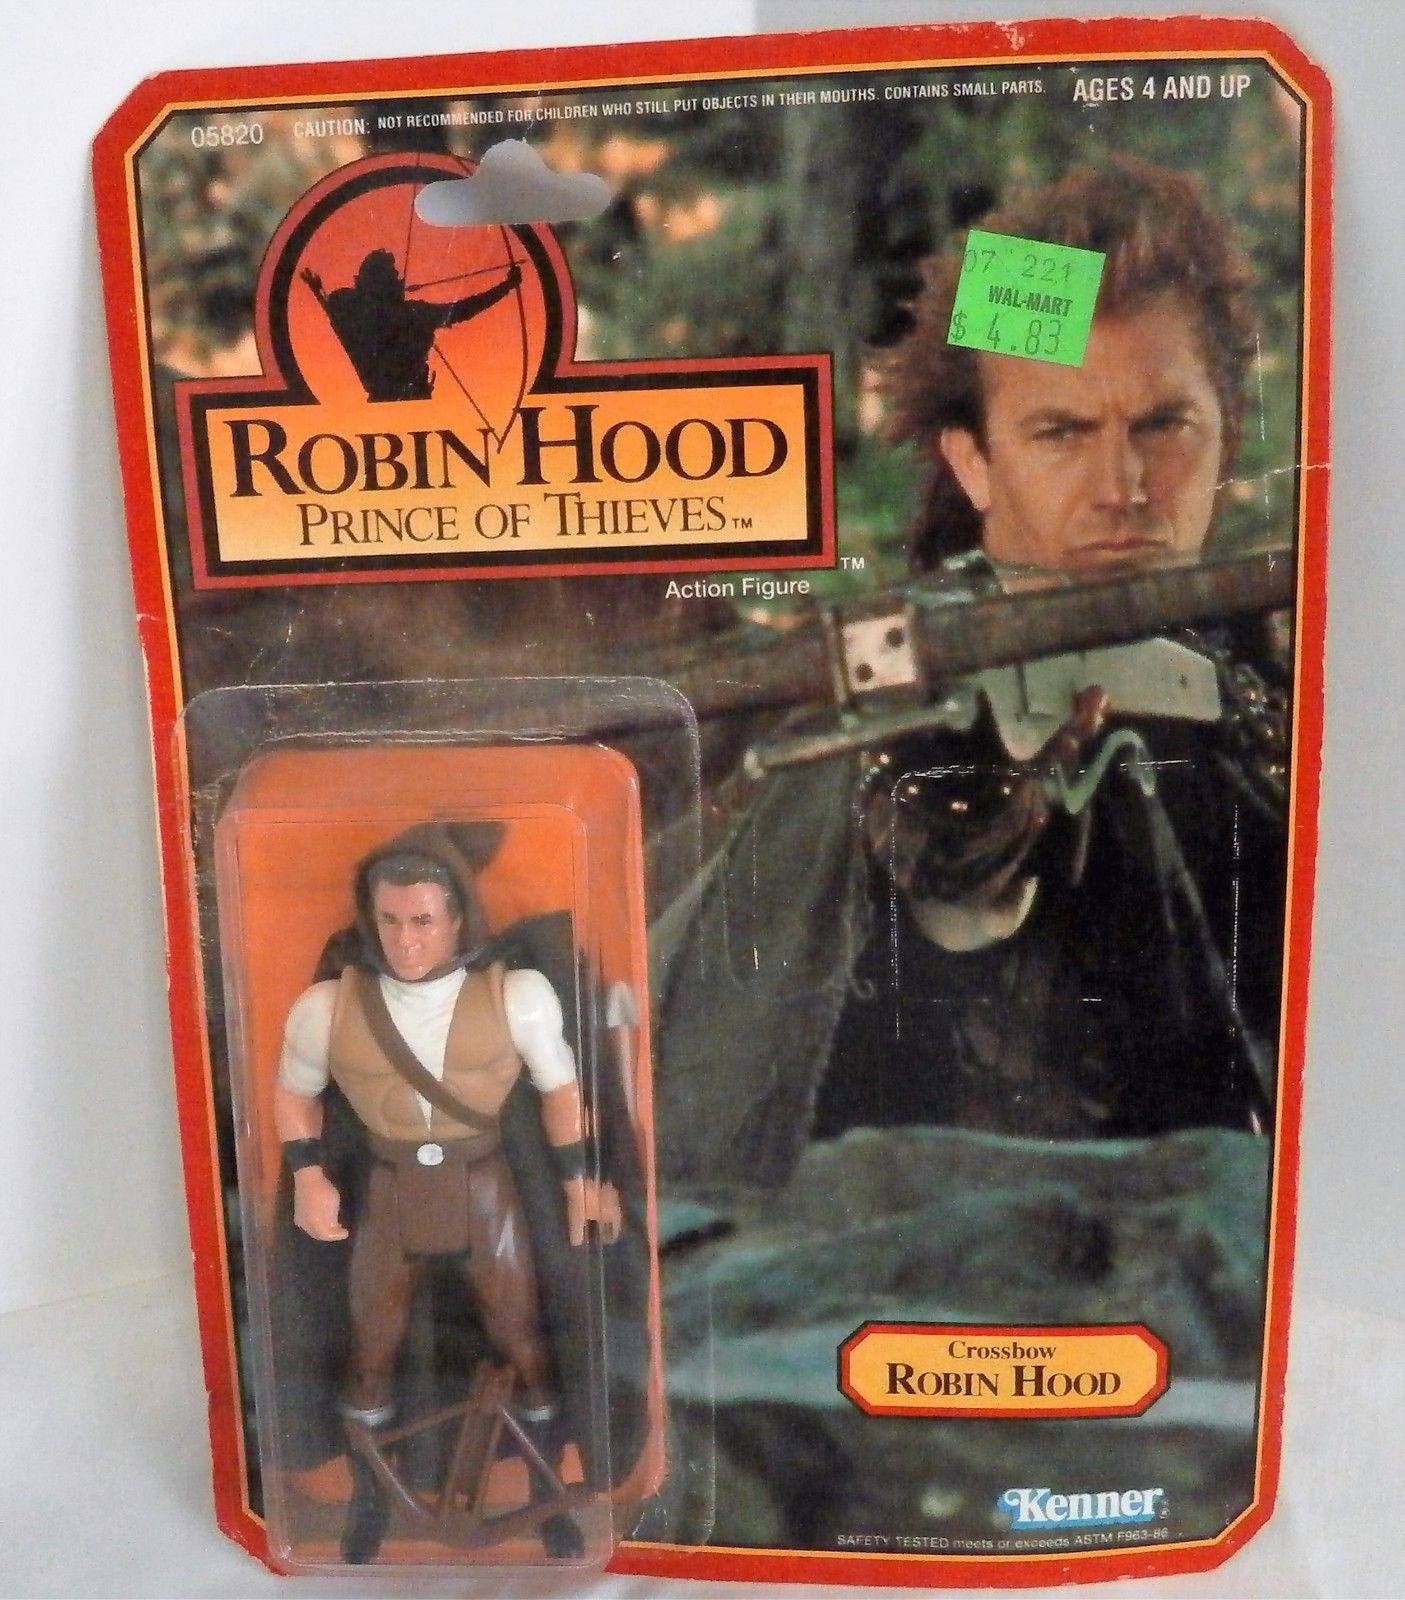 Robin Hood with Crossbow